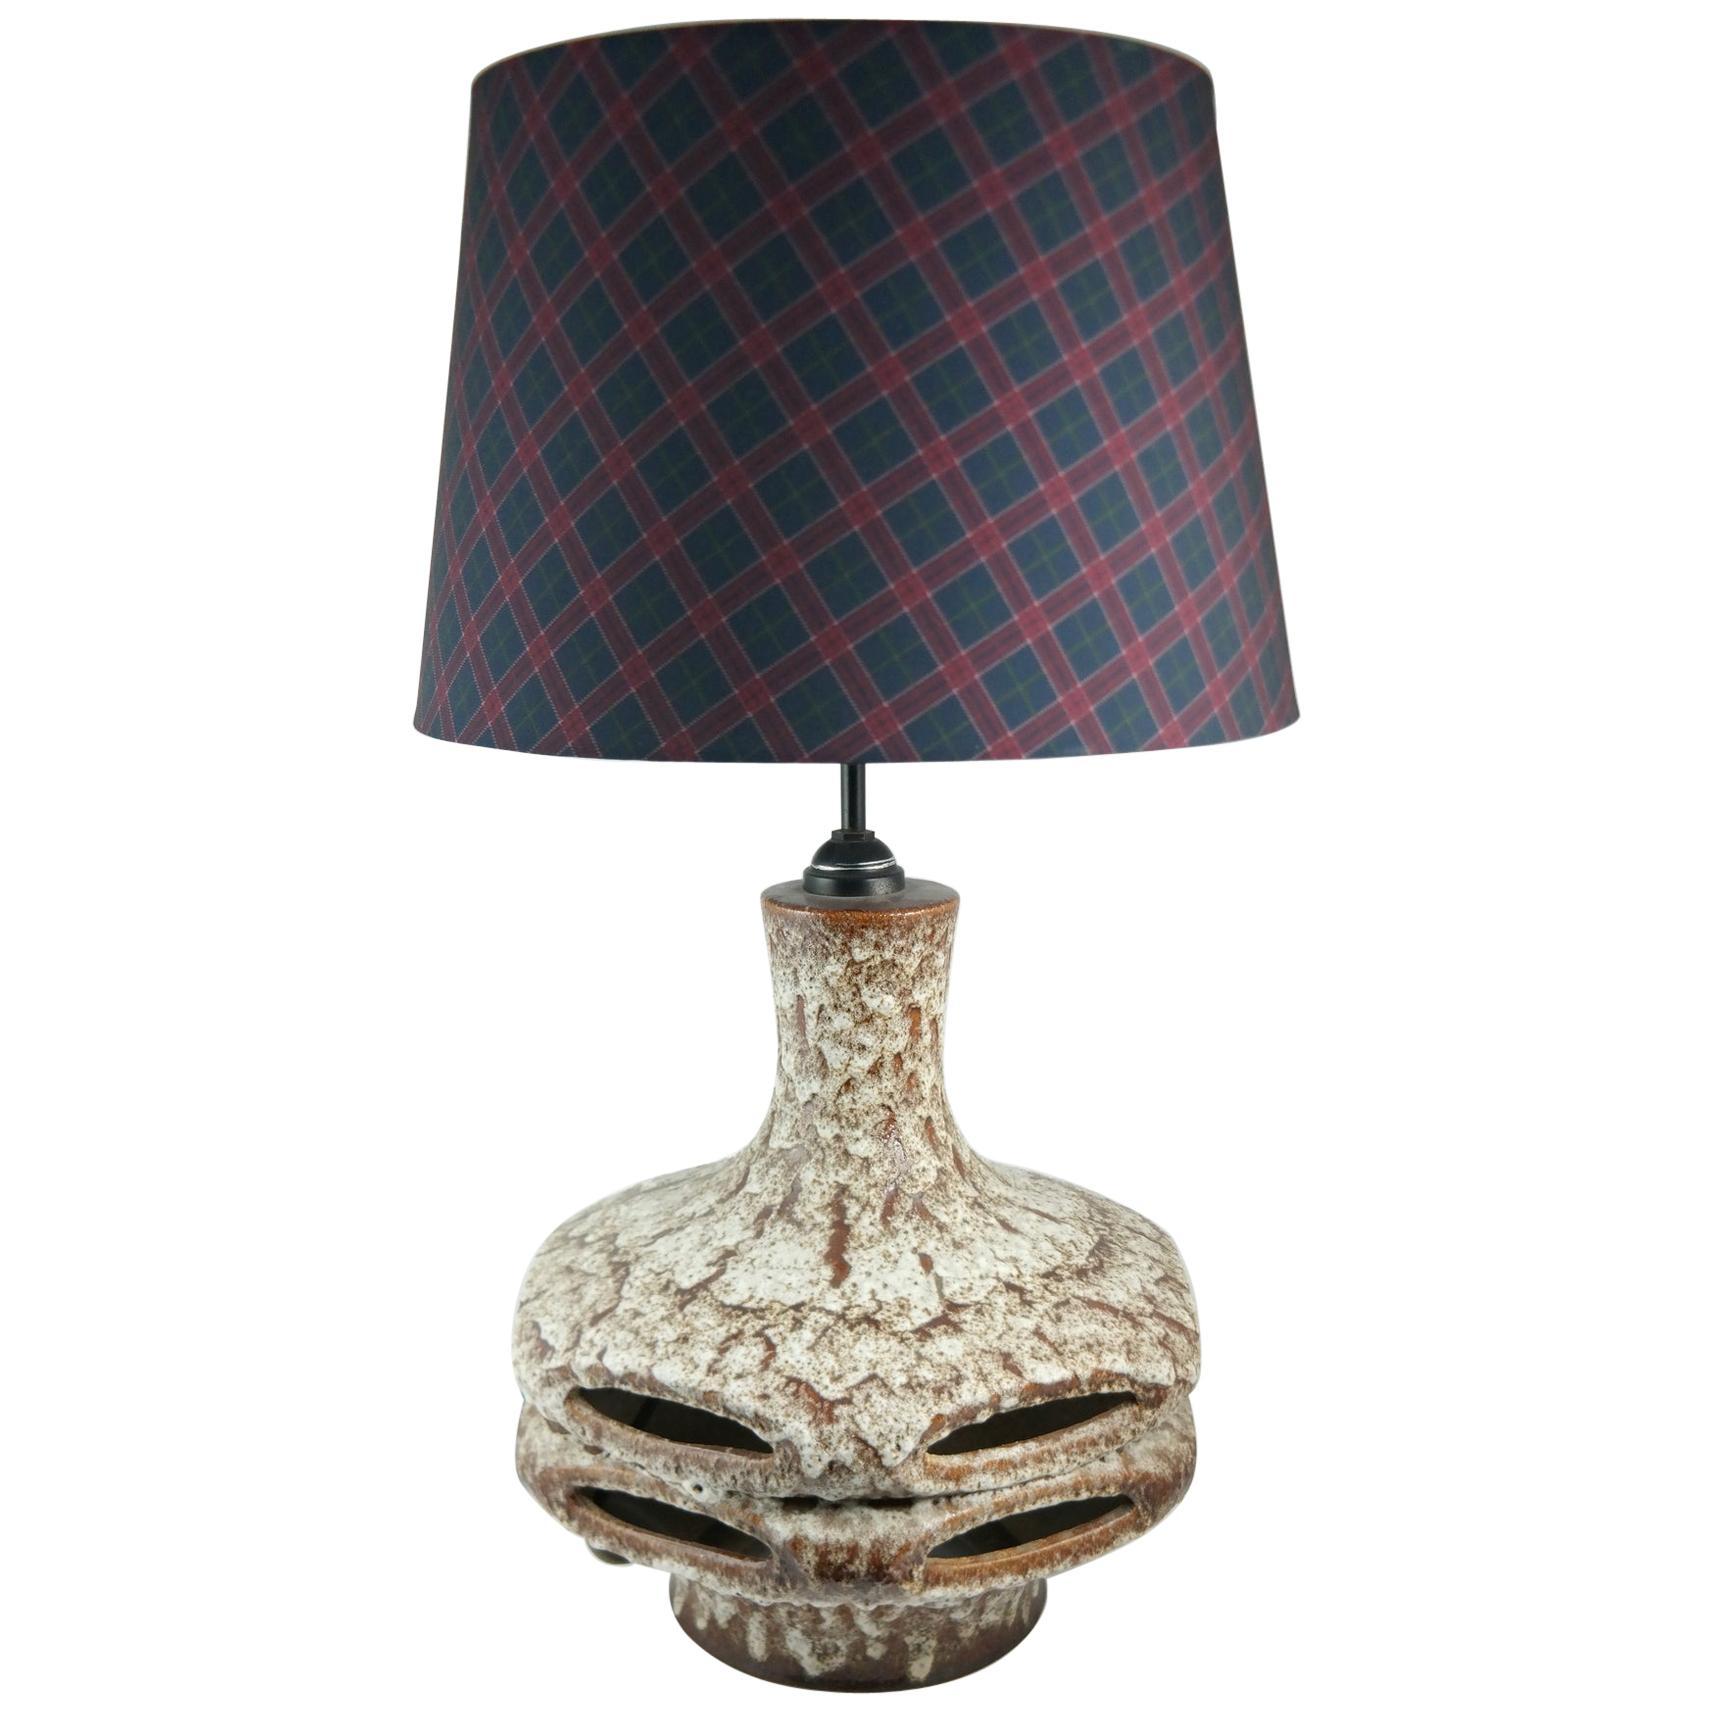 Large Handmade Midcentury Ceramic Table Lamp, 1970s